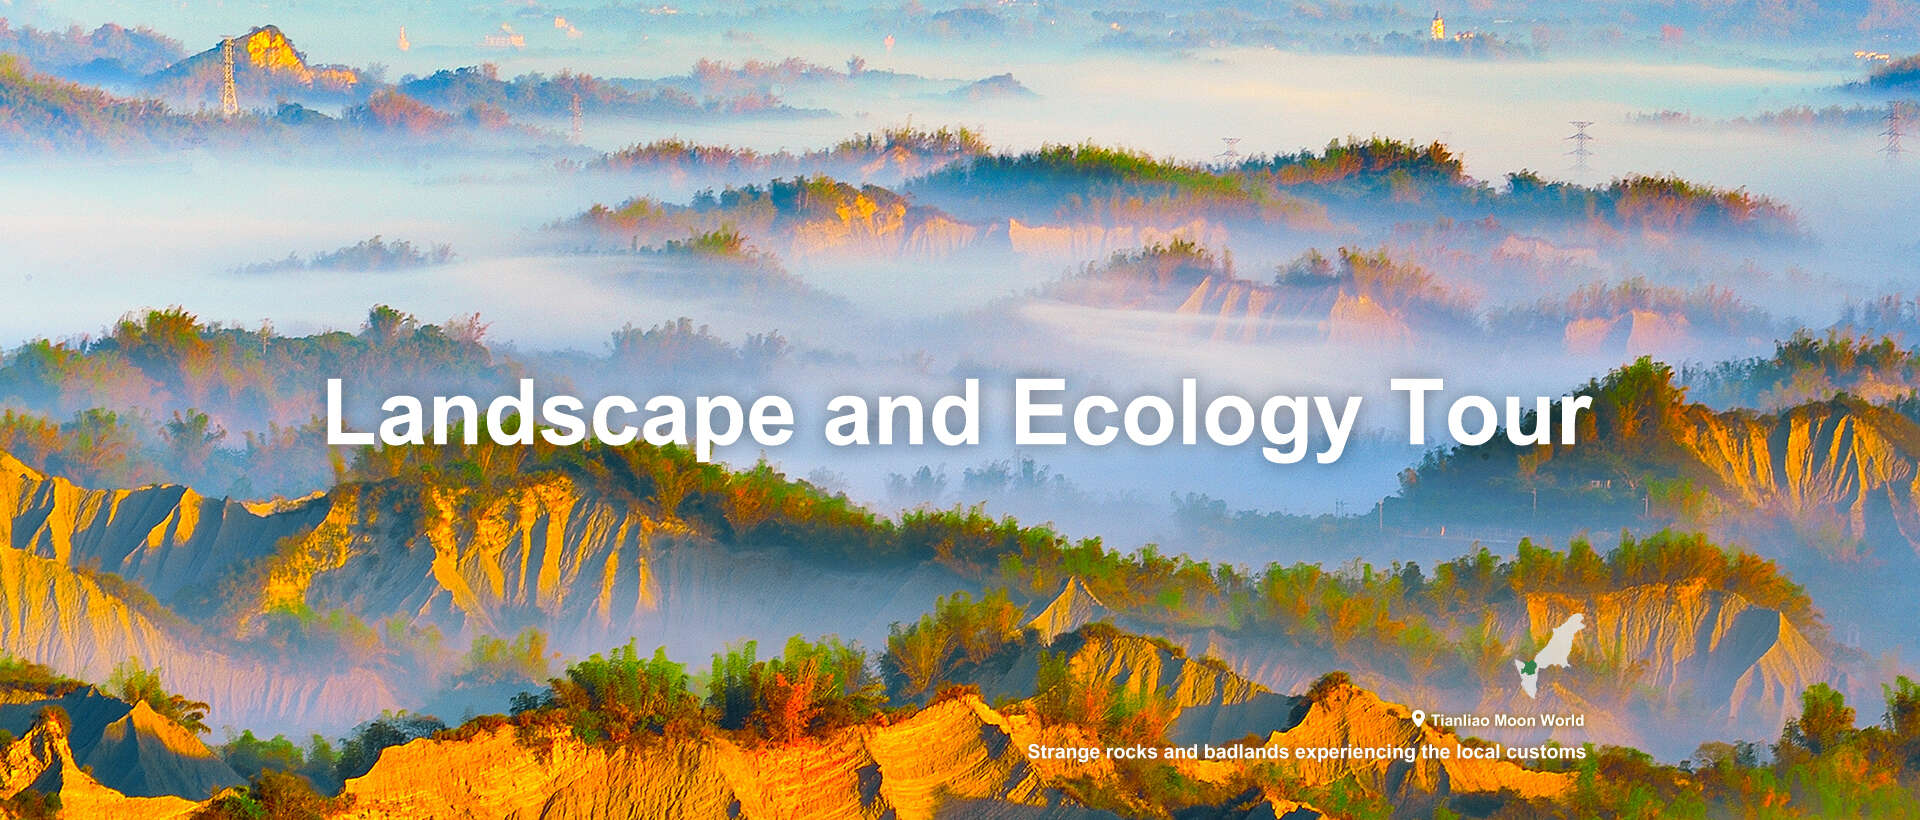 Landscape and Ecology Tour